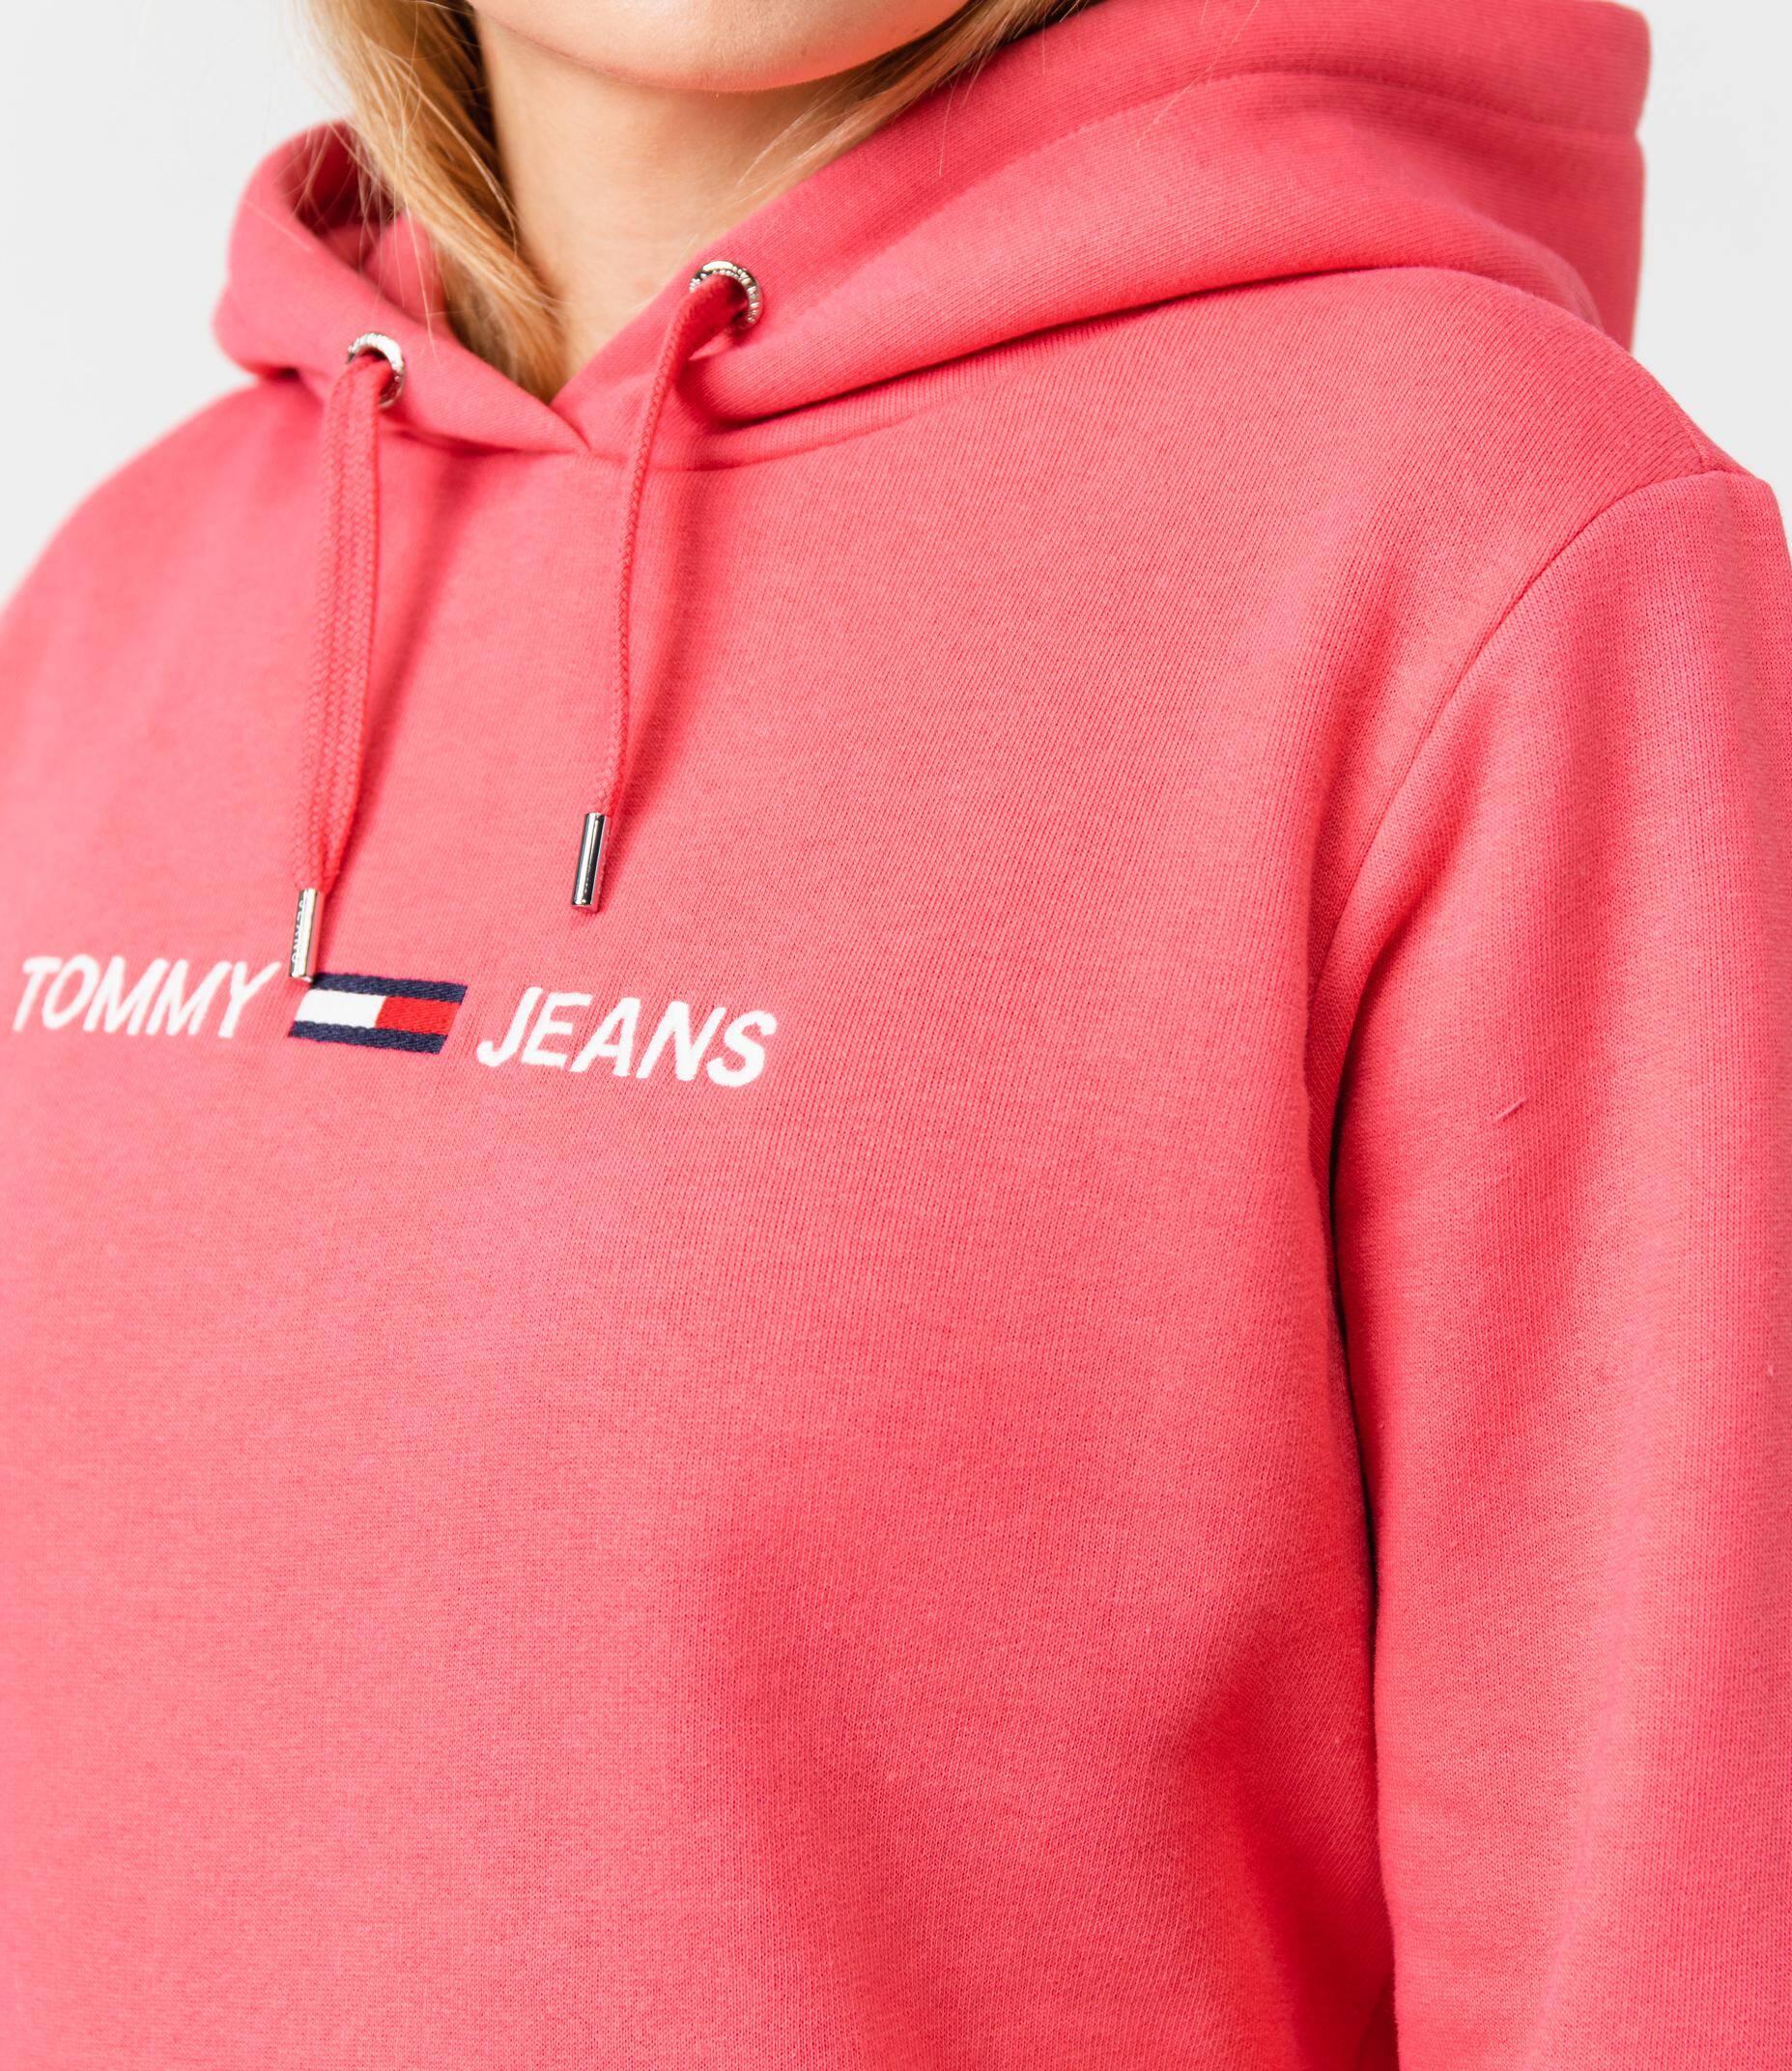 Tommy Hilfiger Tjw Clean Logo